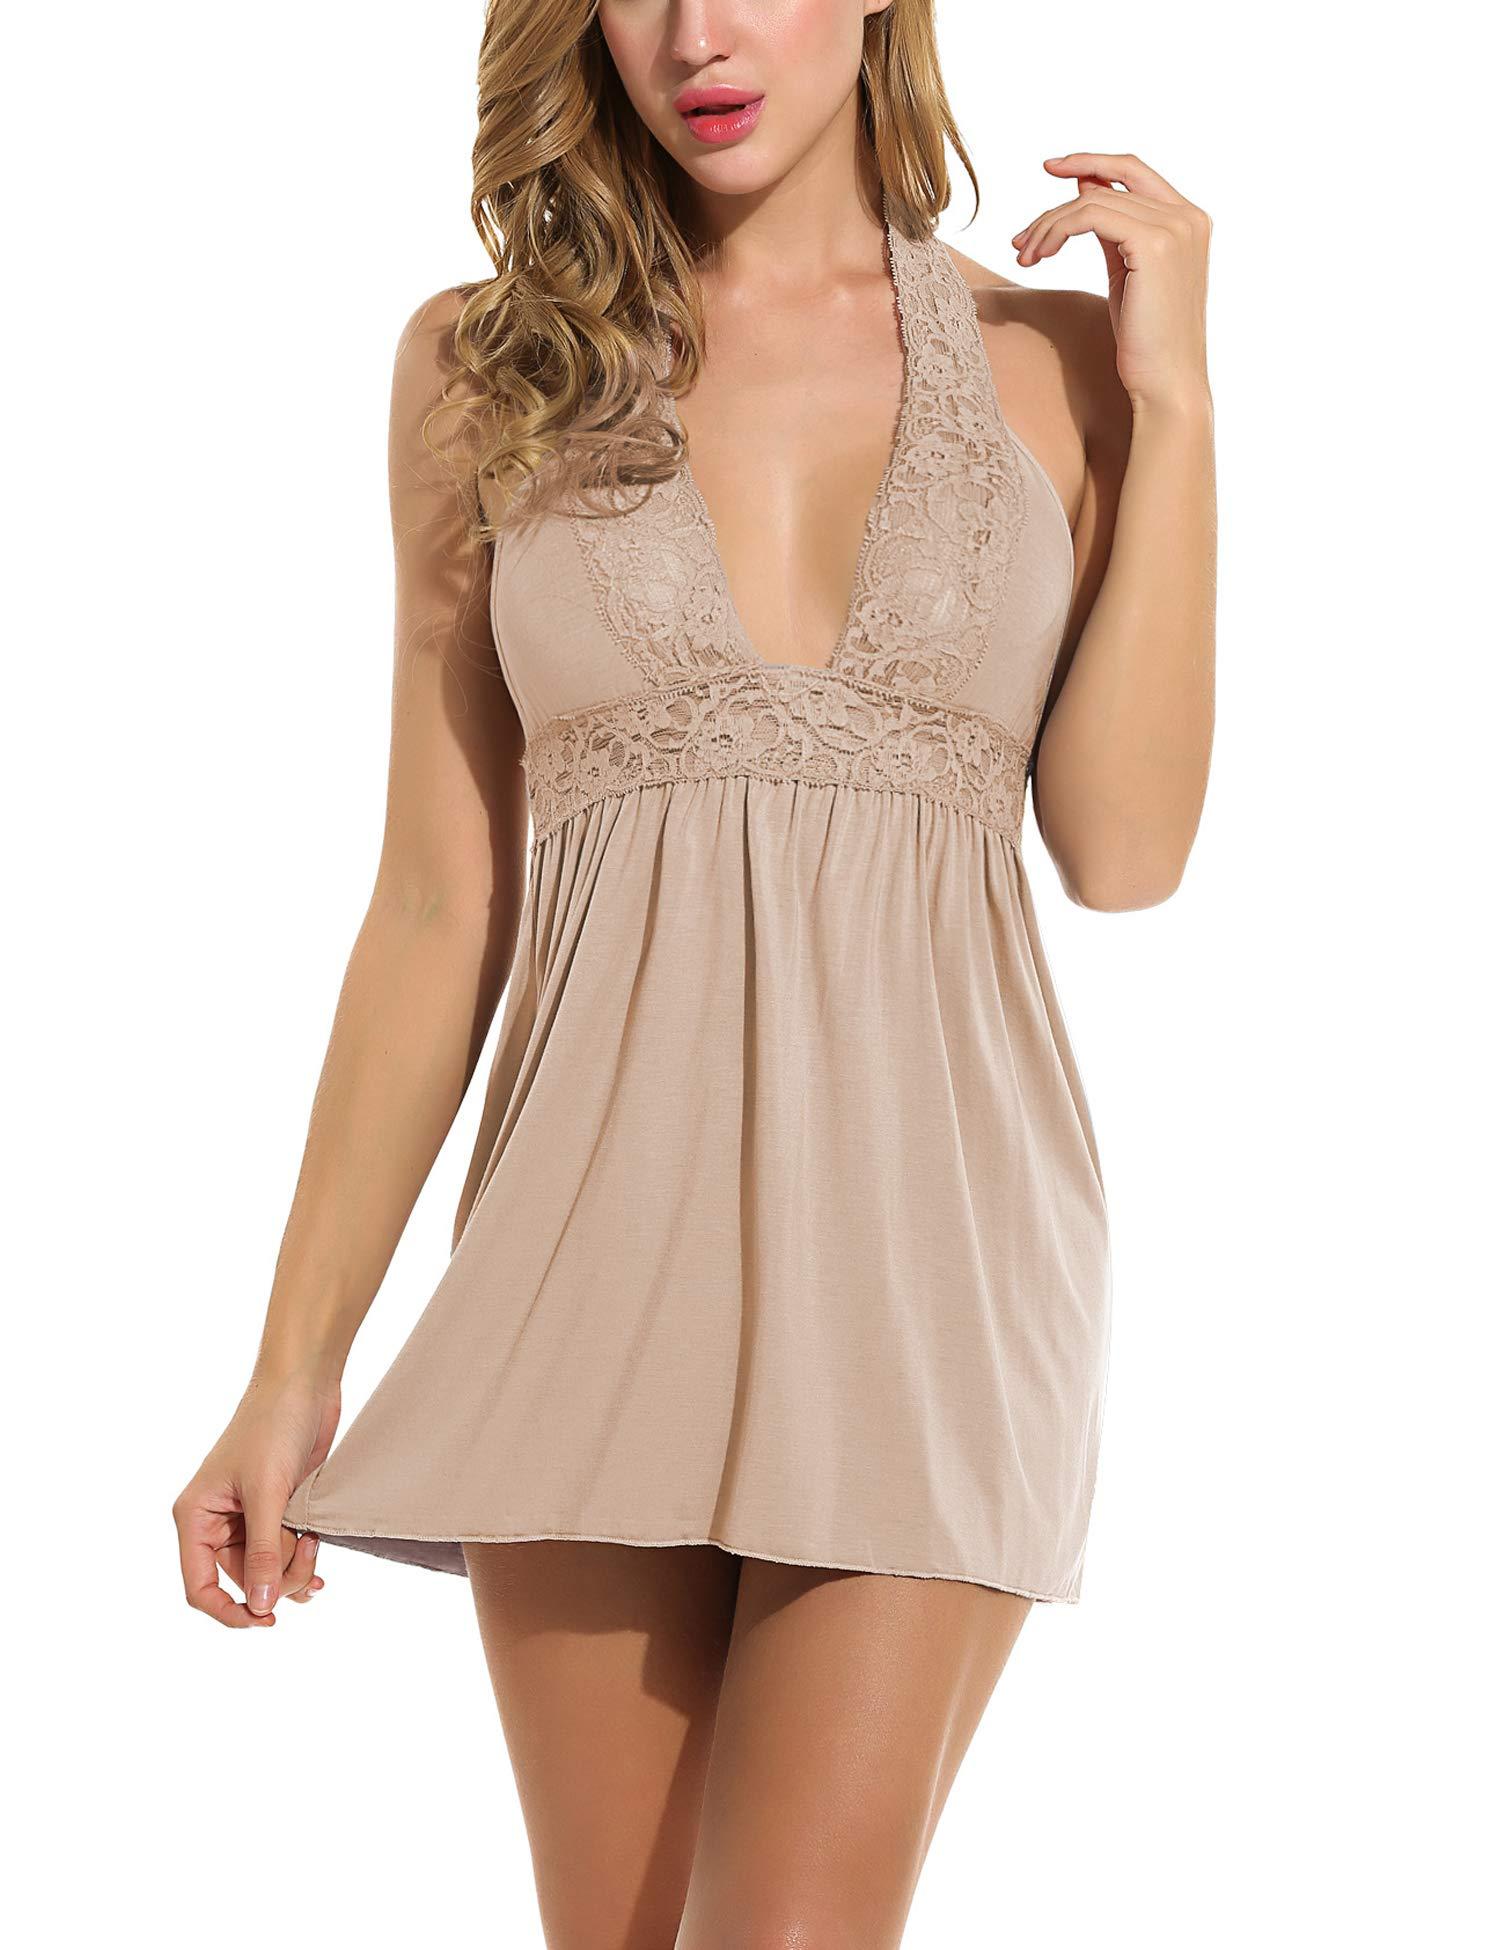 7750a6808 Galleon - Avidlove Women s Lingerie Modal Sleep Dress Sexy Chemise Nighty  Mini Full Slip Lace Babydoll